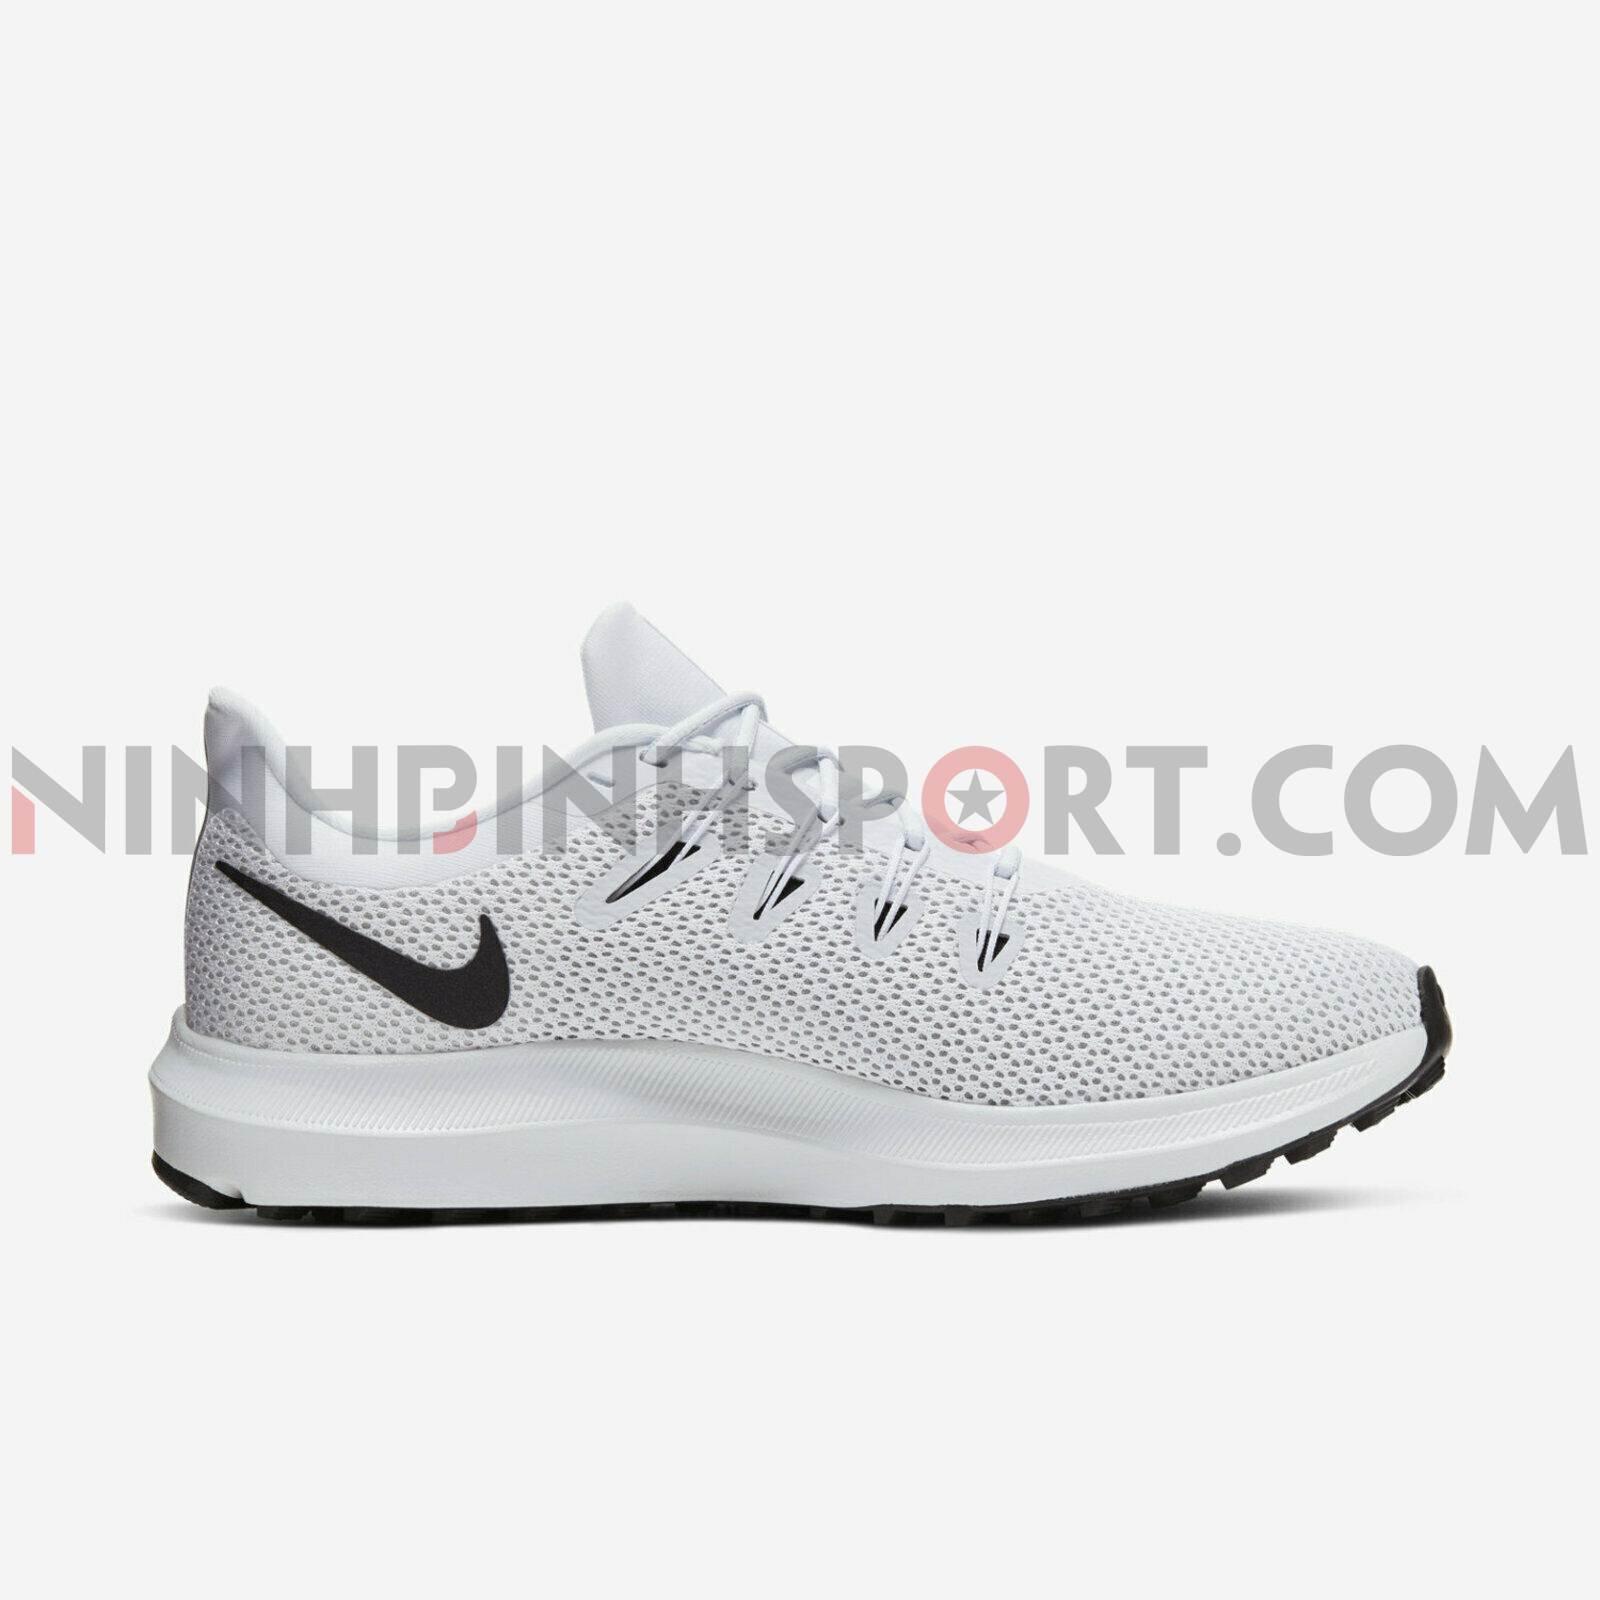 Giày thể thao nữ Nike Wmns Quest 2 CI3803-100